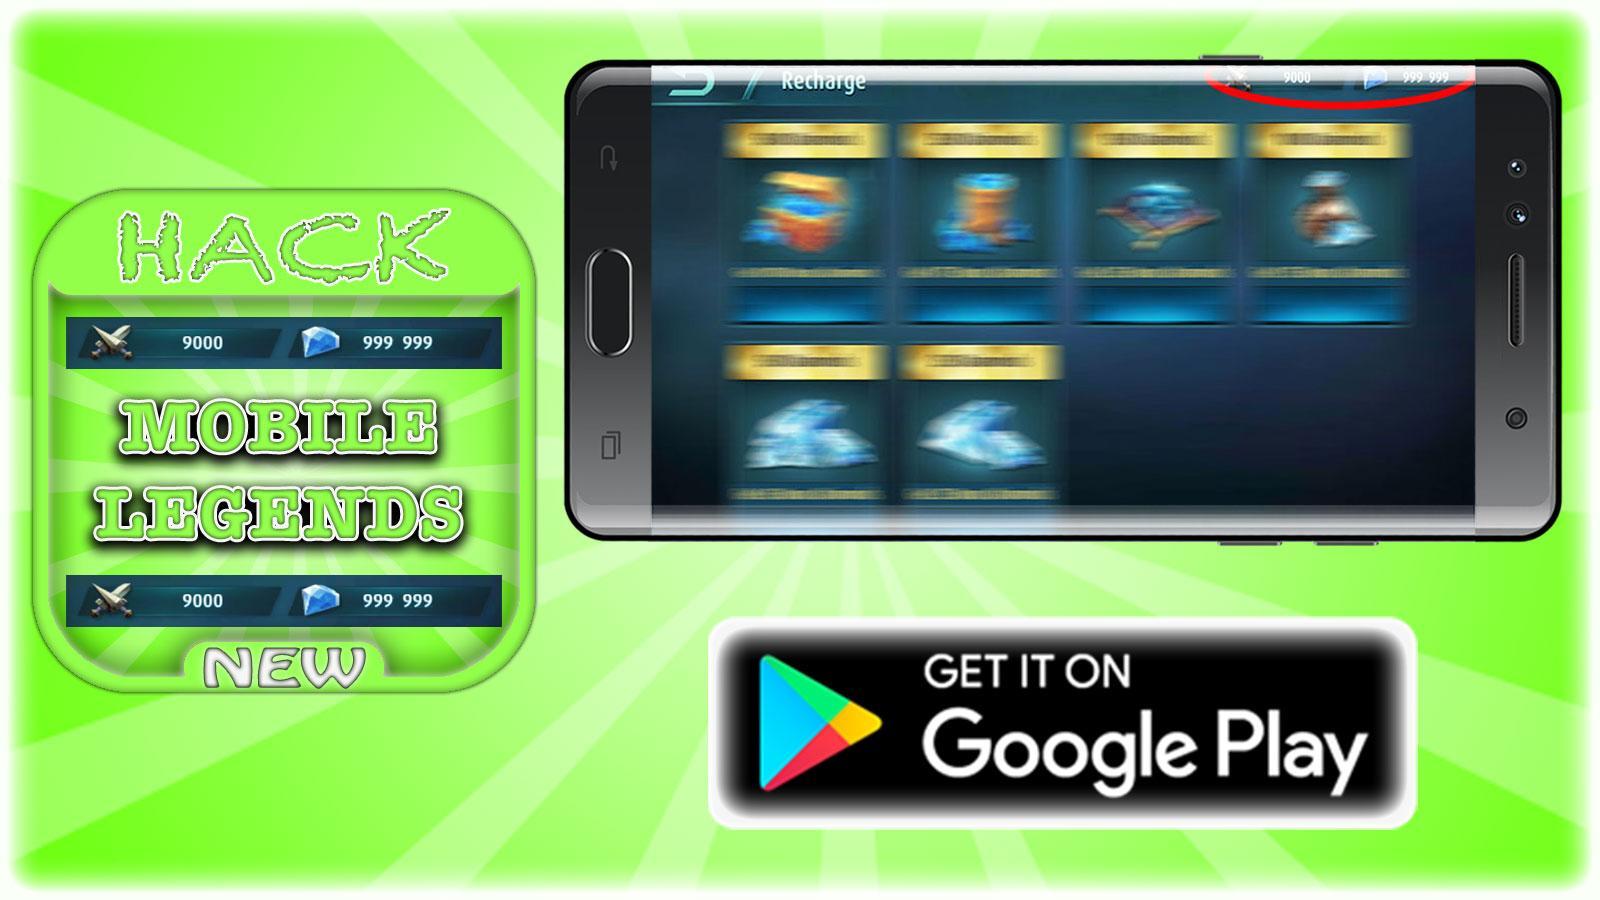 download aplikasi choki choki mobile legends augmented reality apps